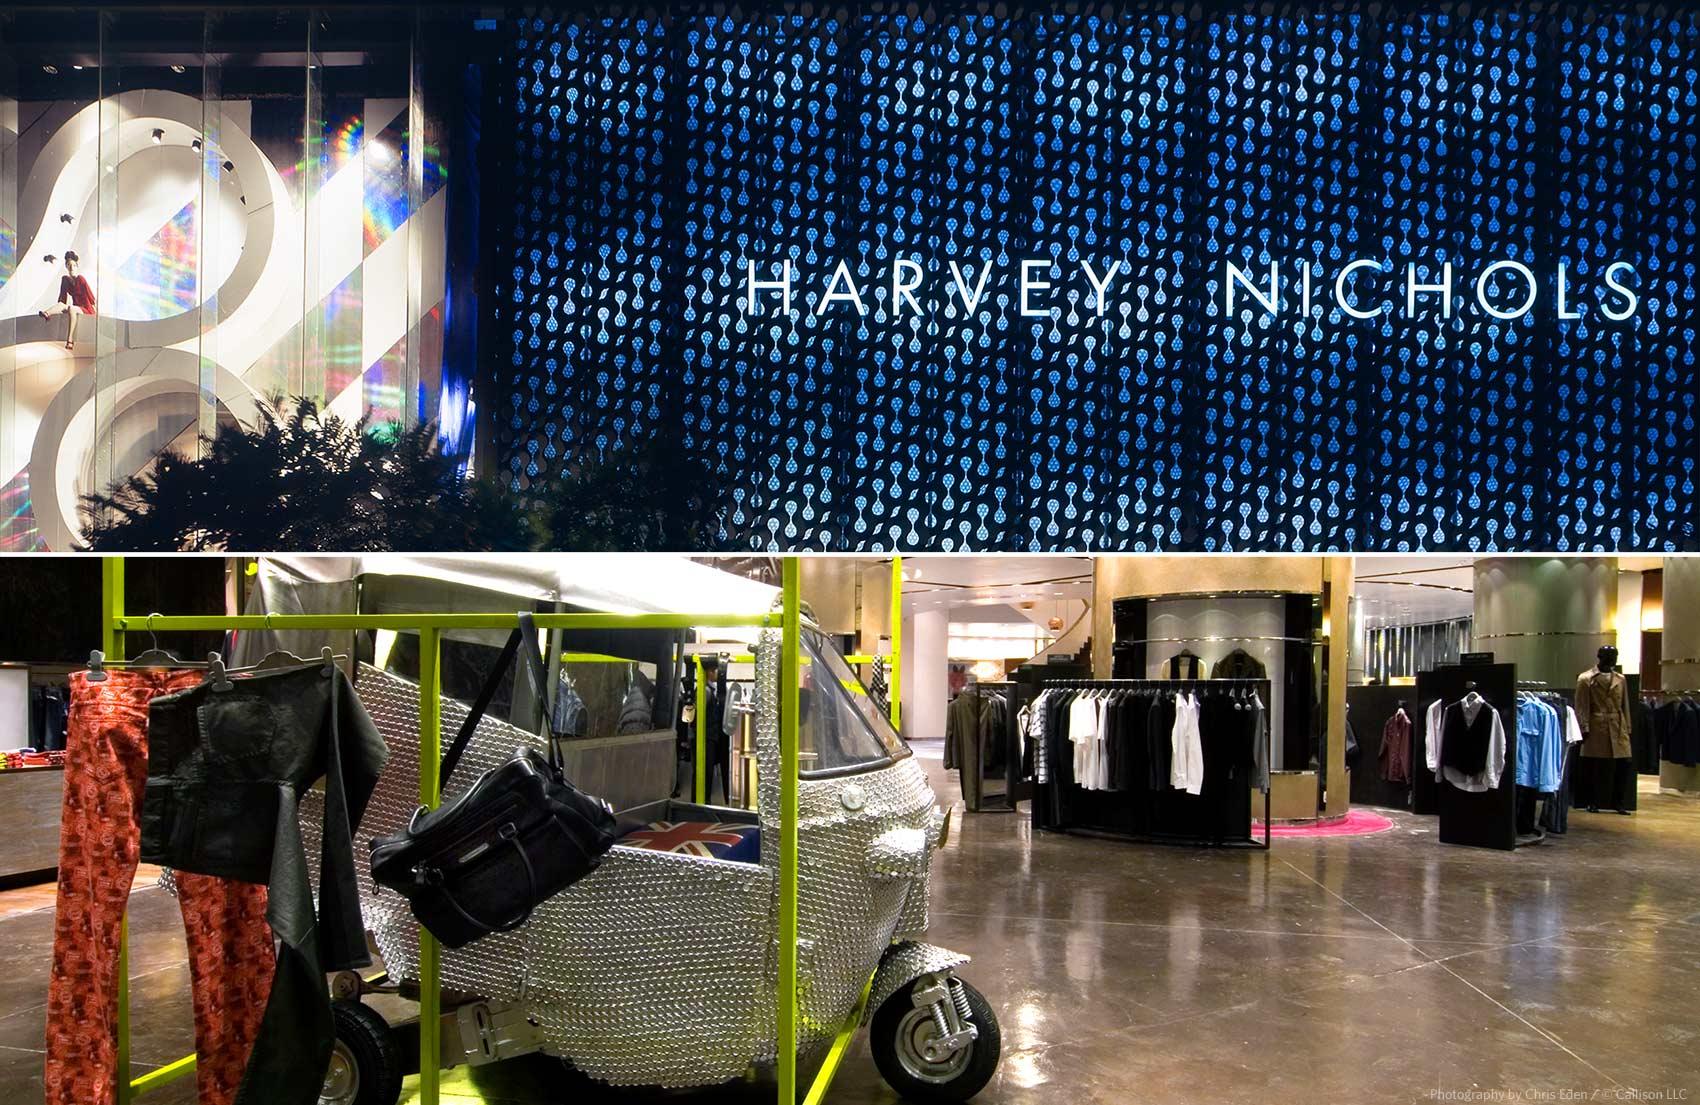 Harvey Nichols - Jakarta - Exterior and Interior details